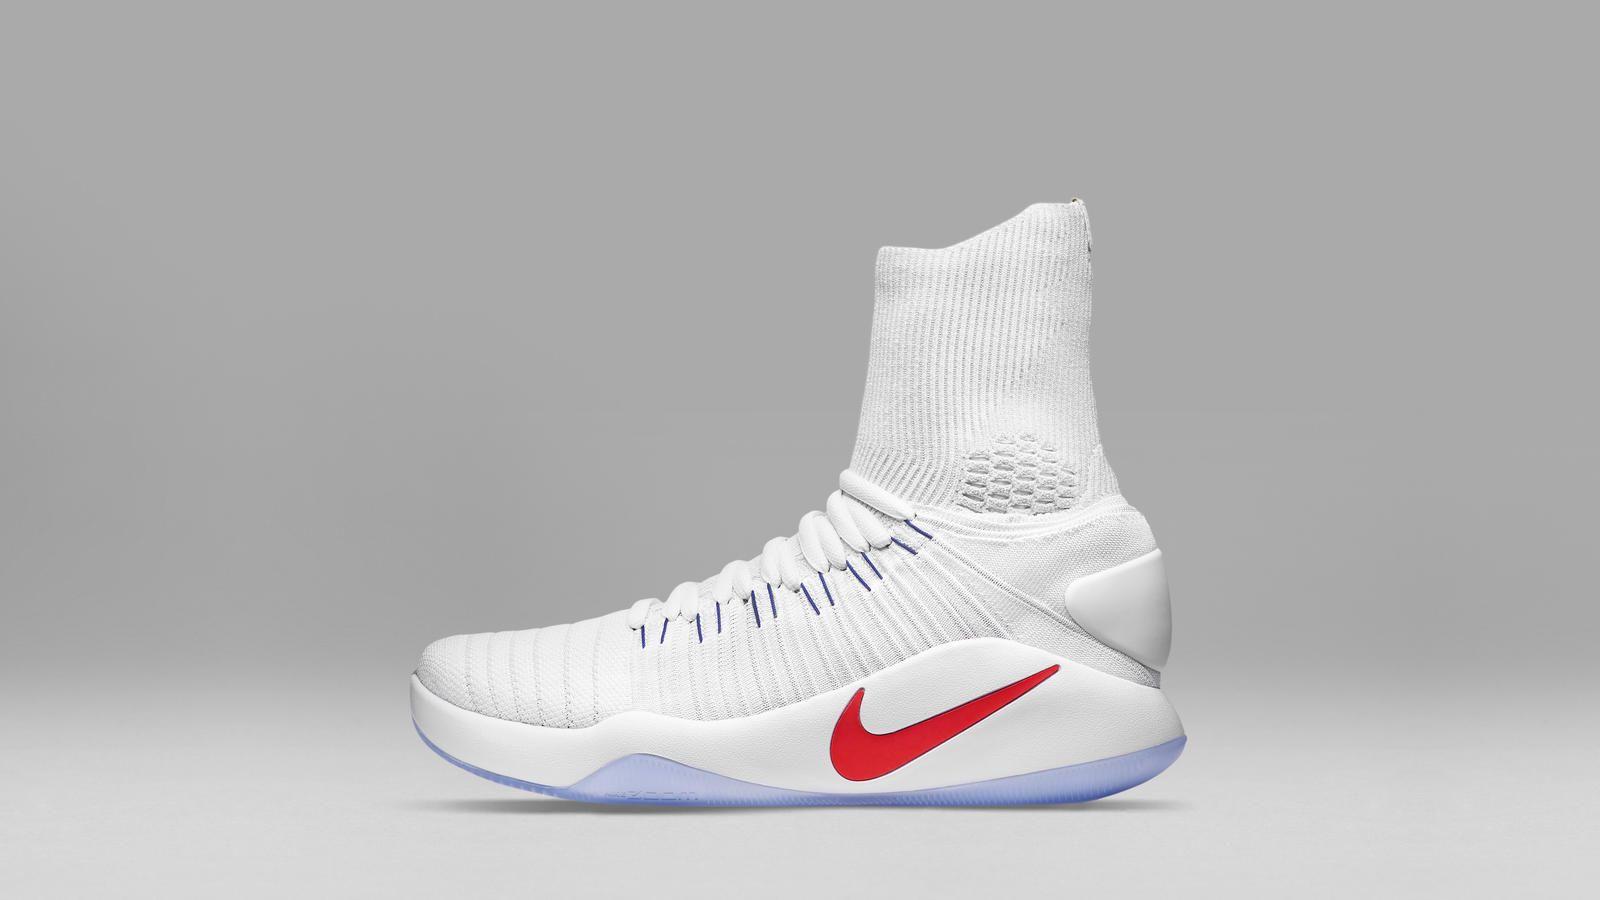 Nike Hyperdunk 2016 Exemplifies Performance Innovation Nike Nike Innovation Sneakers